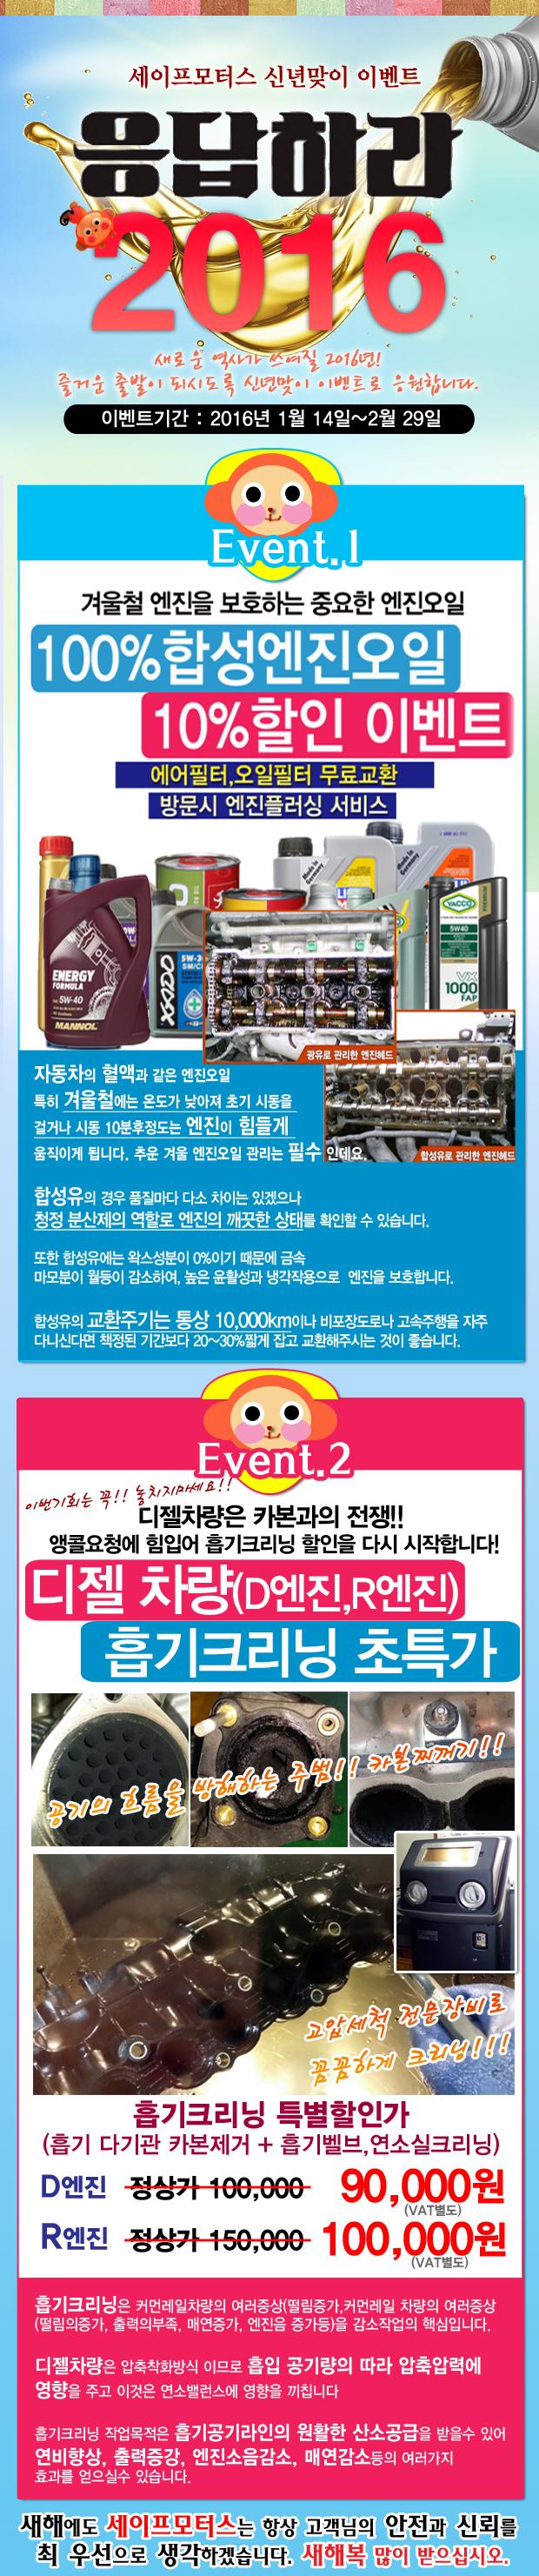 event_201601.jpg